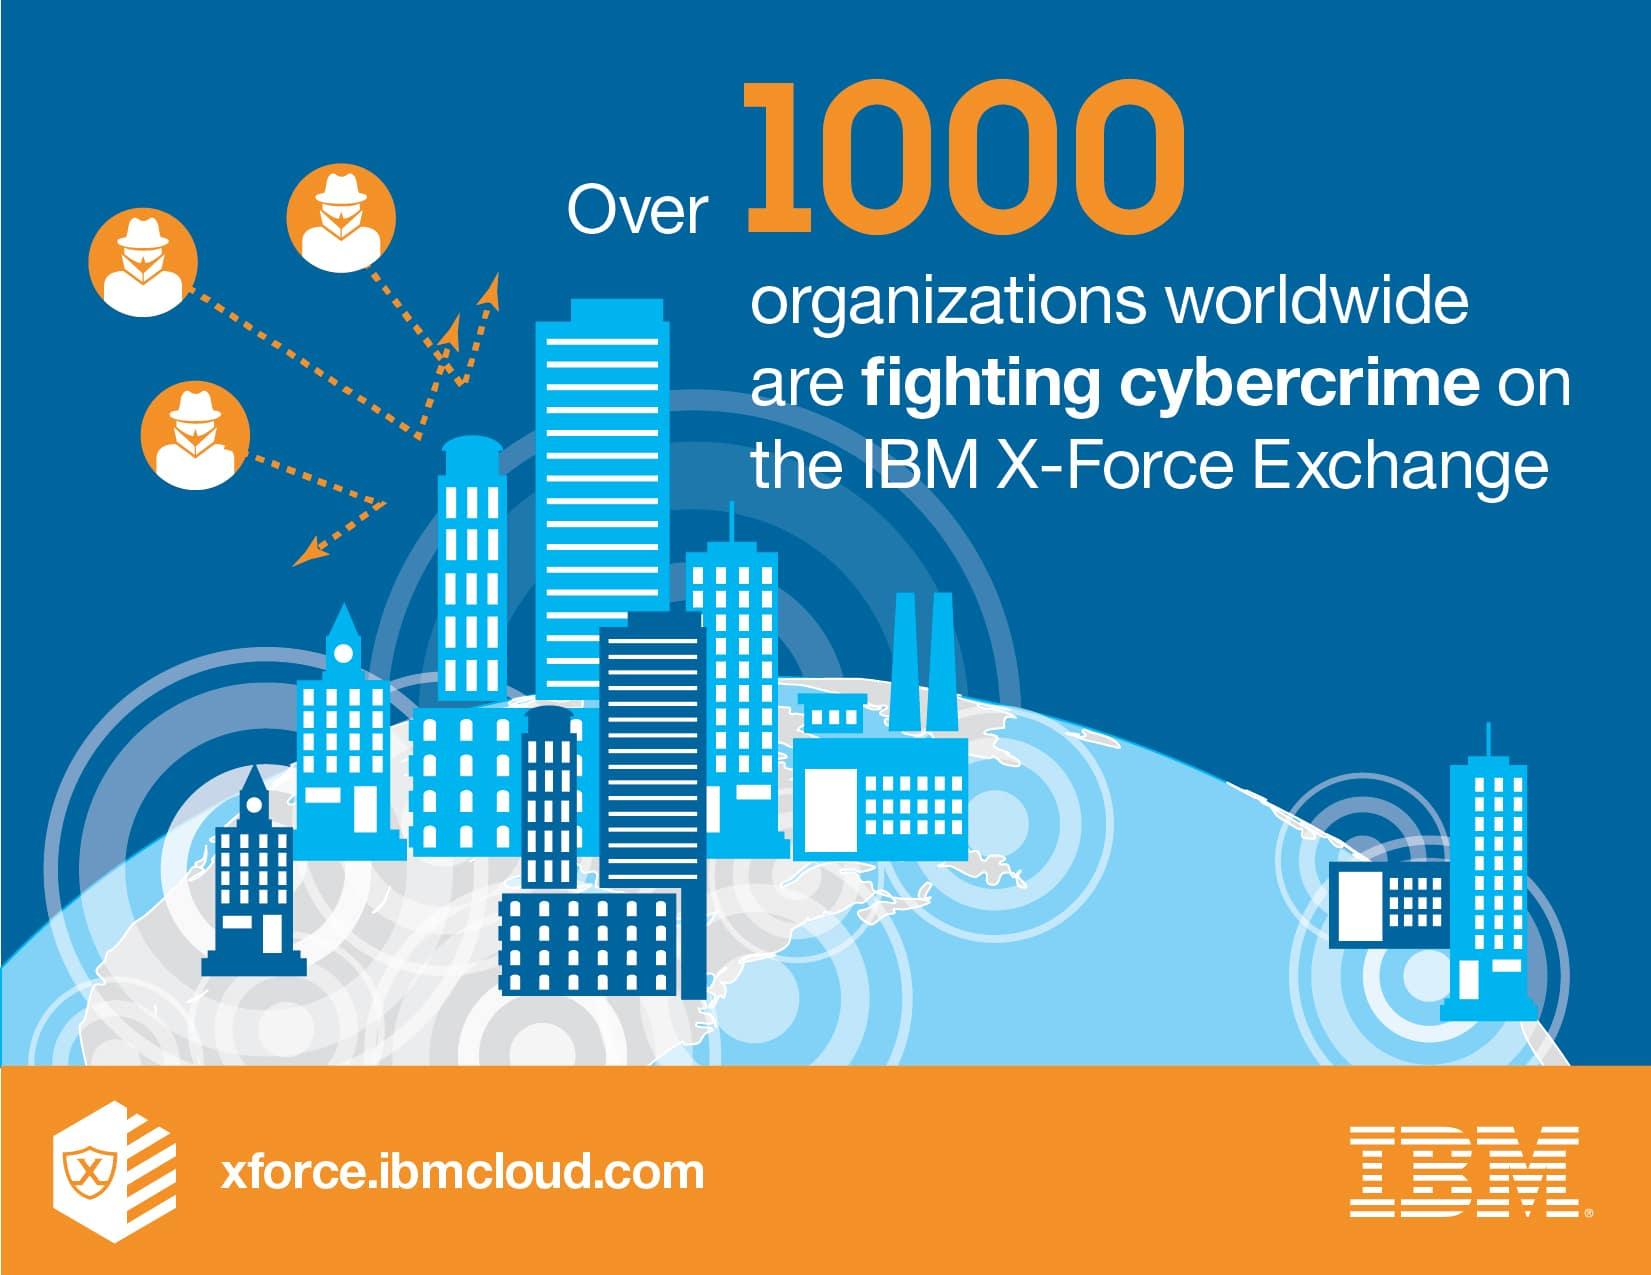 IBM xforce